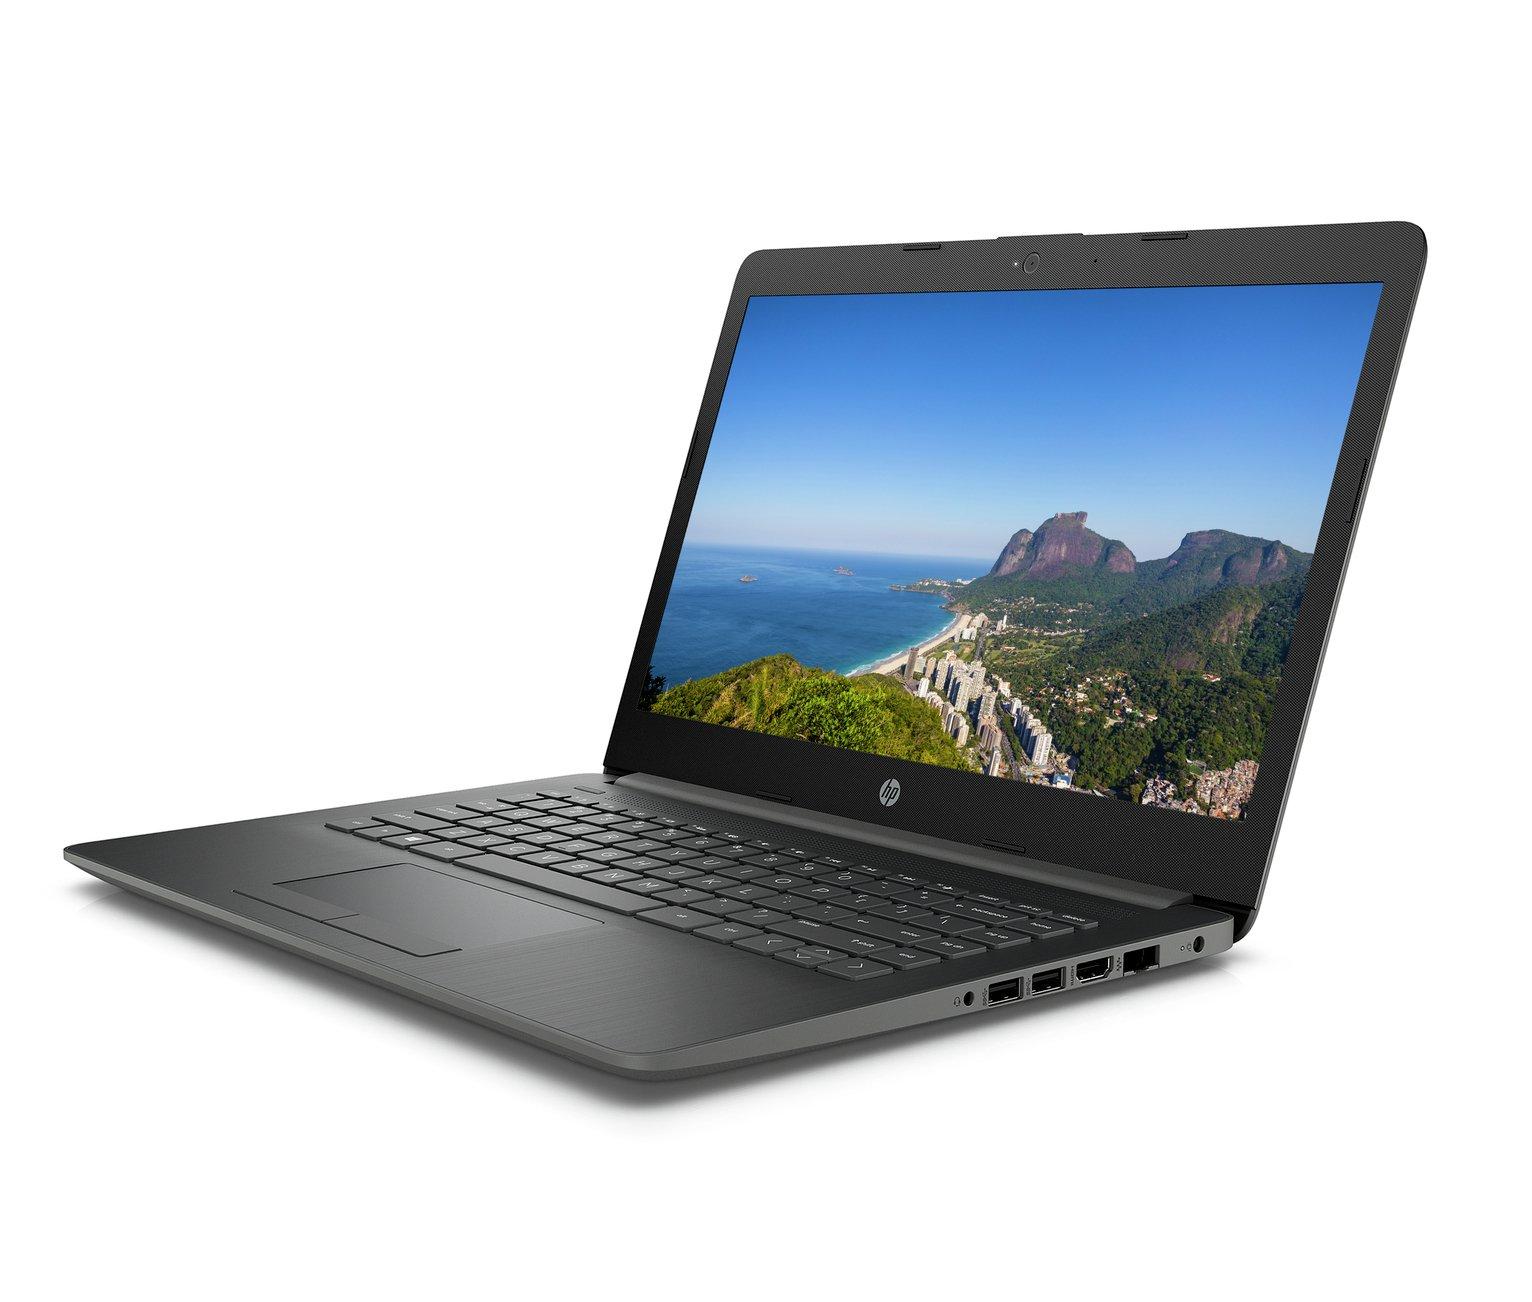 HP 14 Inch AMD A4 4GB 256GB Laptop - Smoke Grey